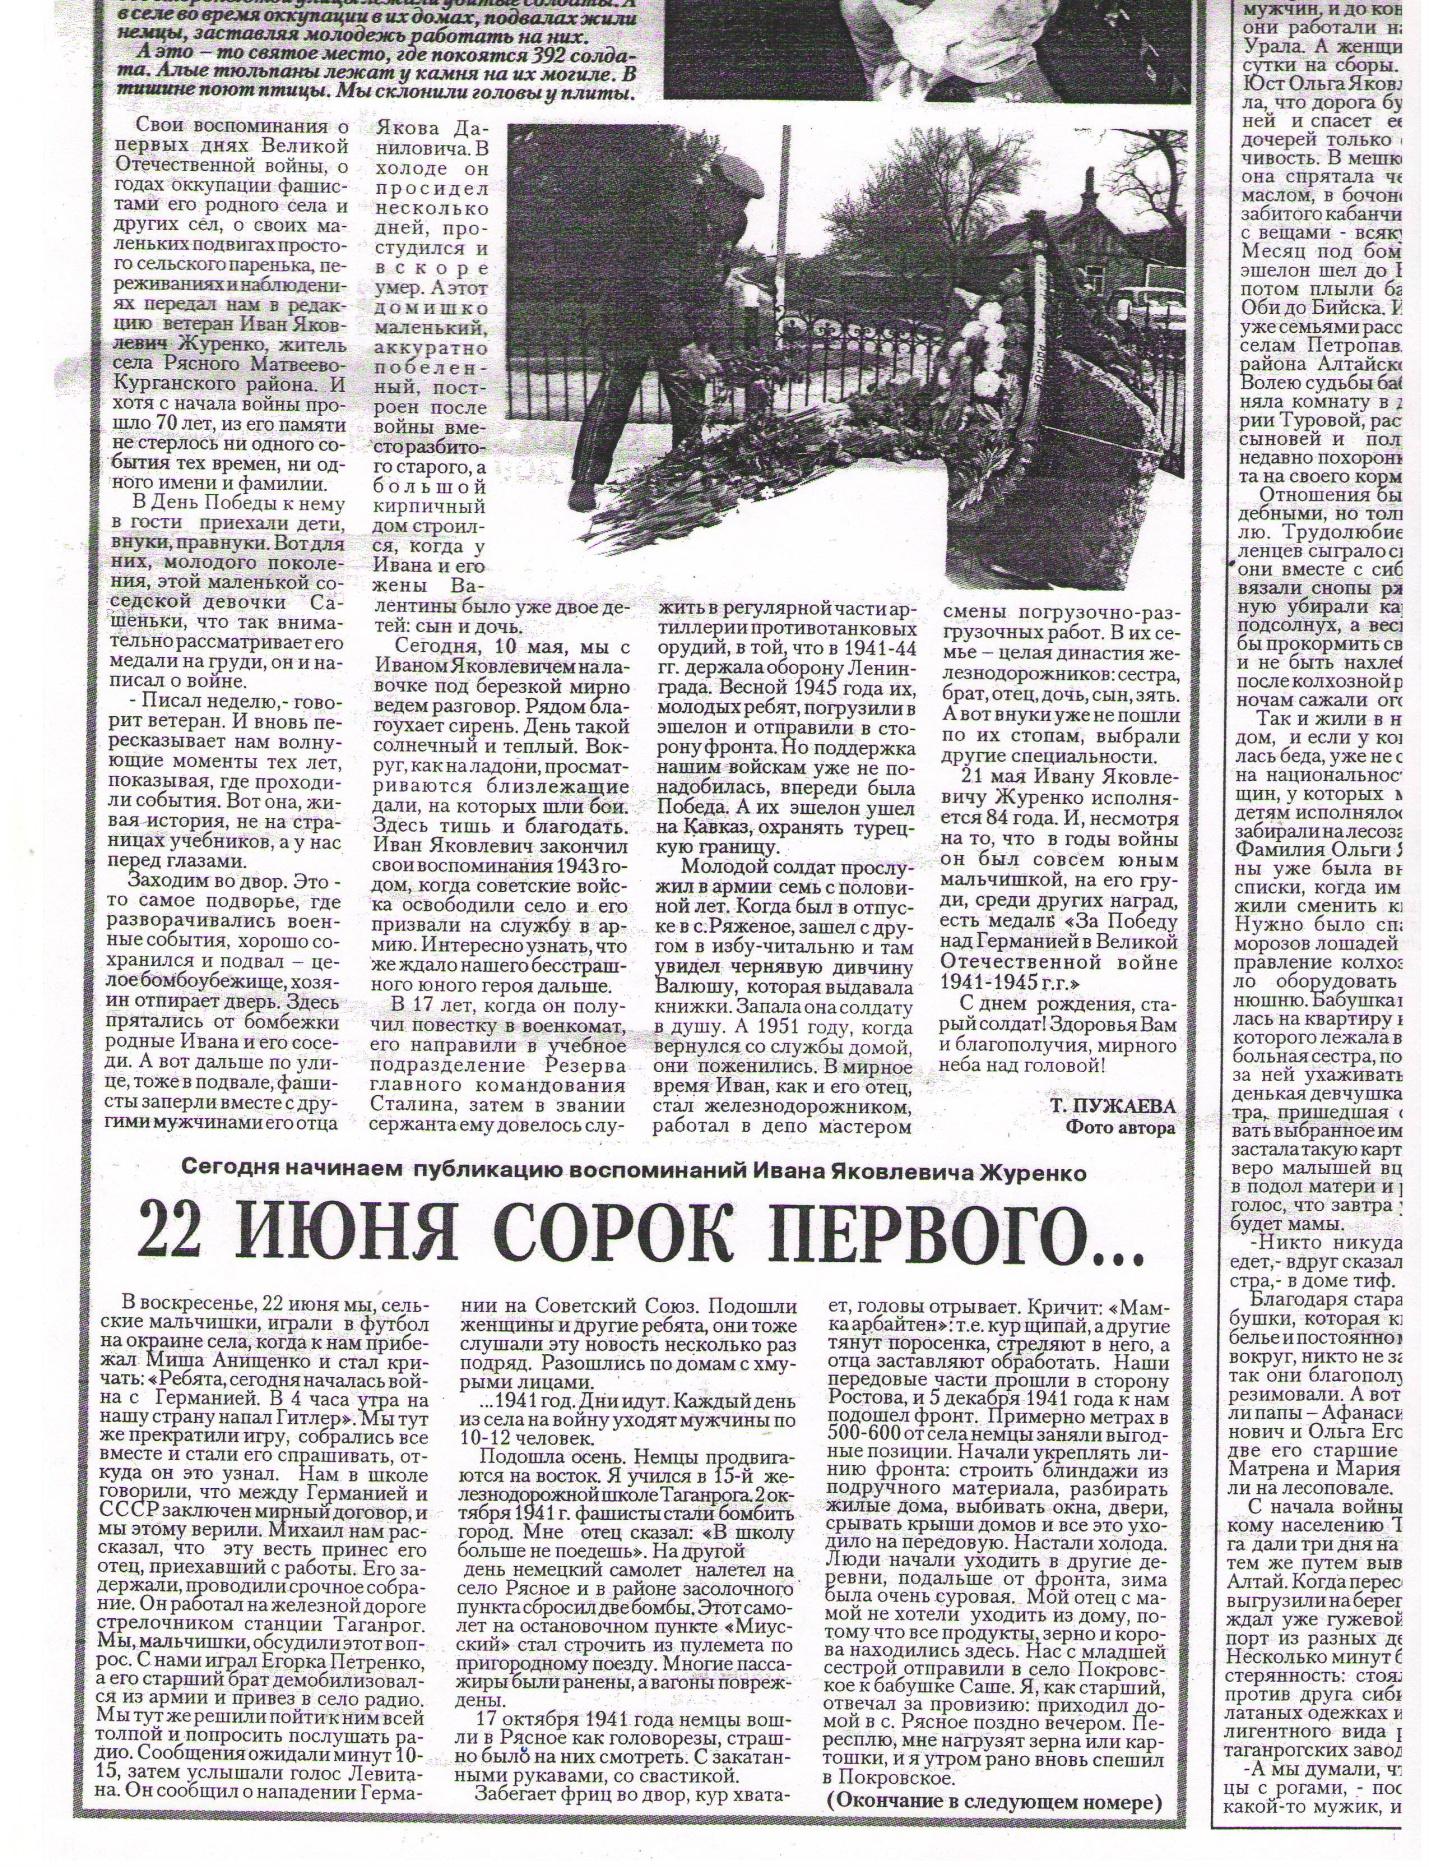 C:\Documents and Settings\СоцПед\Рабочий стол\2013-11-18\Изображение0003.JPG